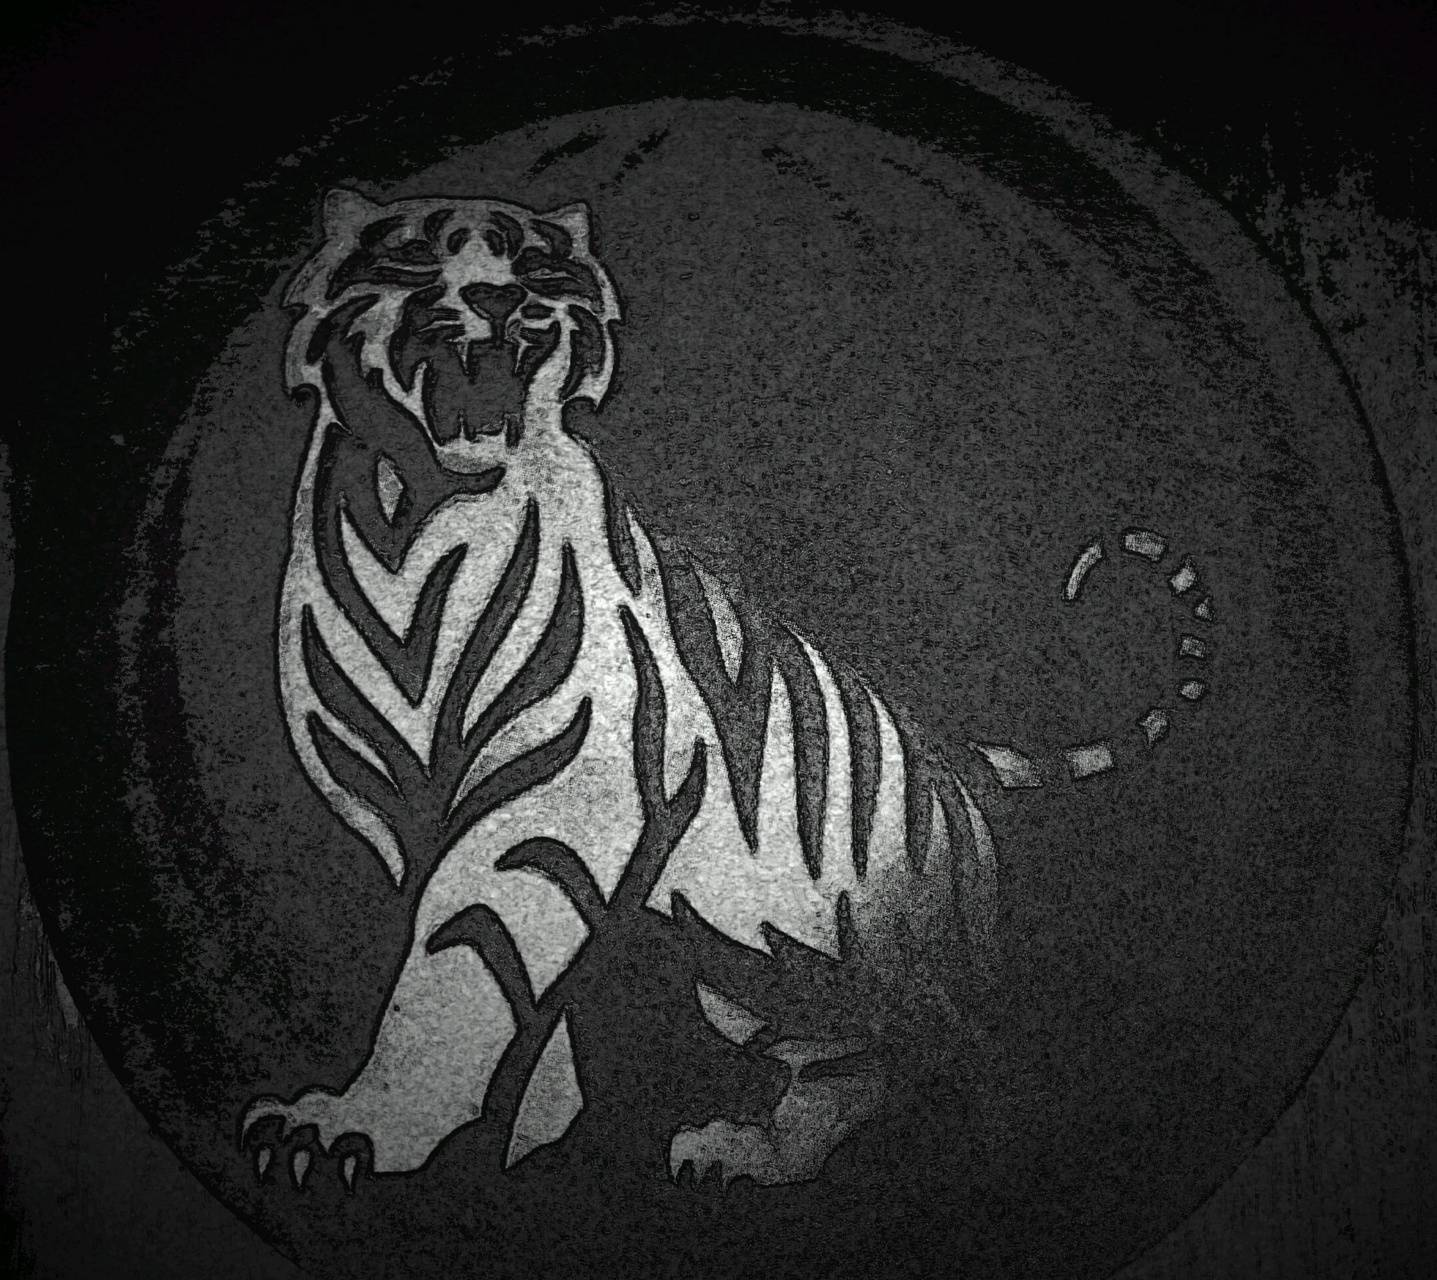 Tiger charcoal